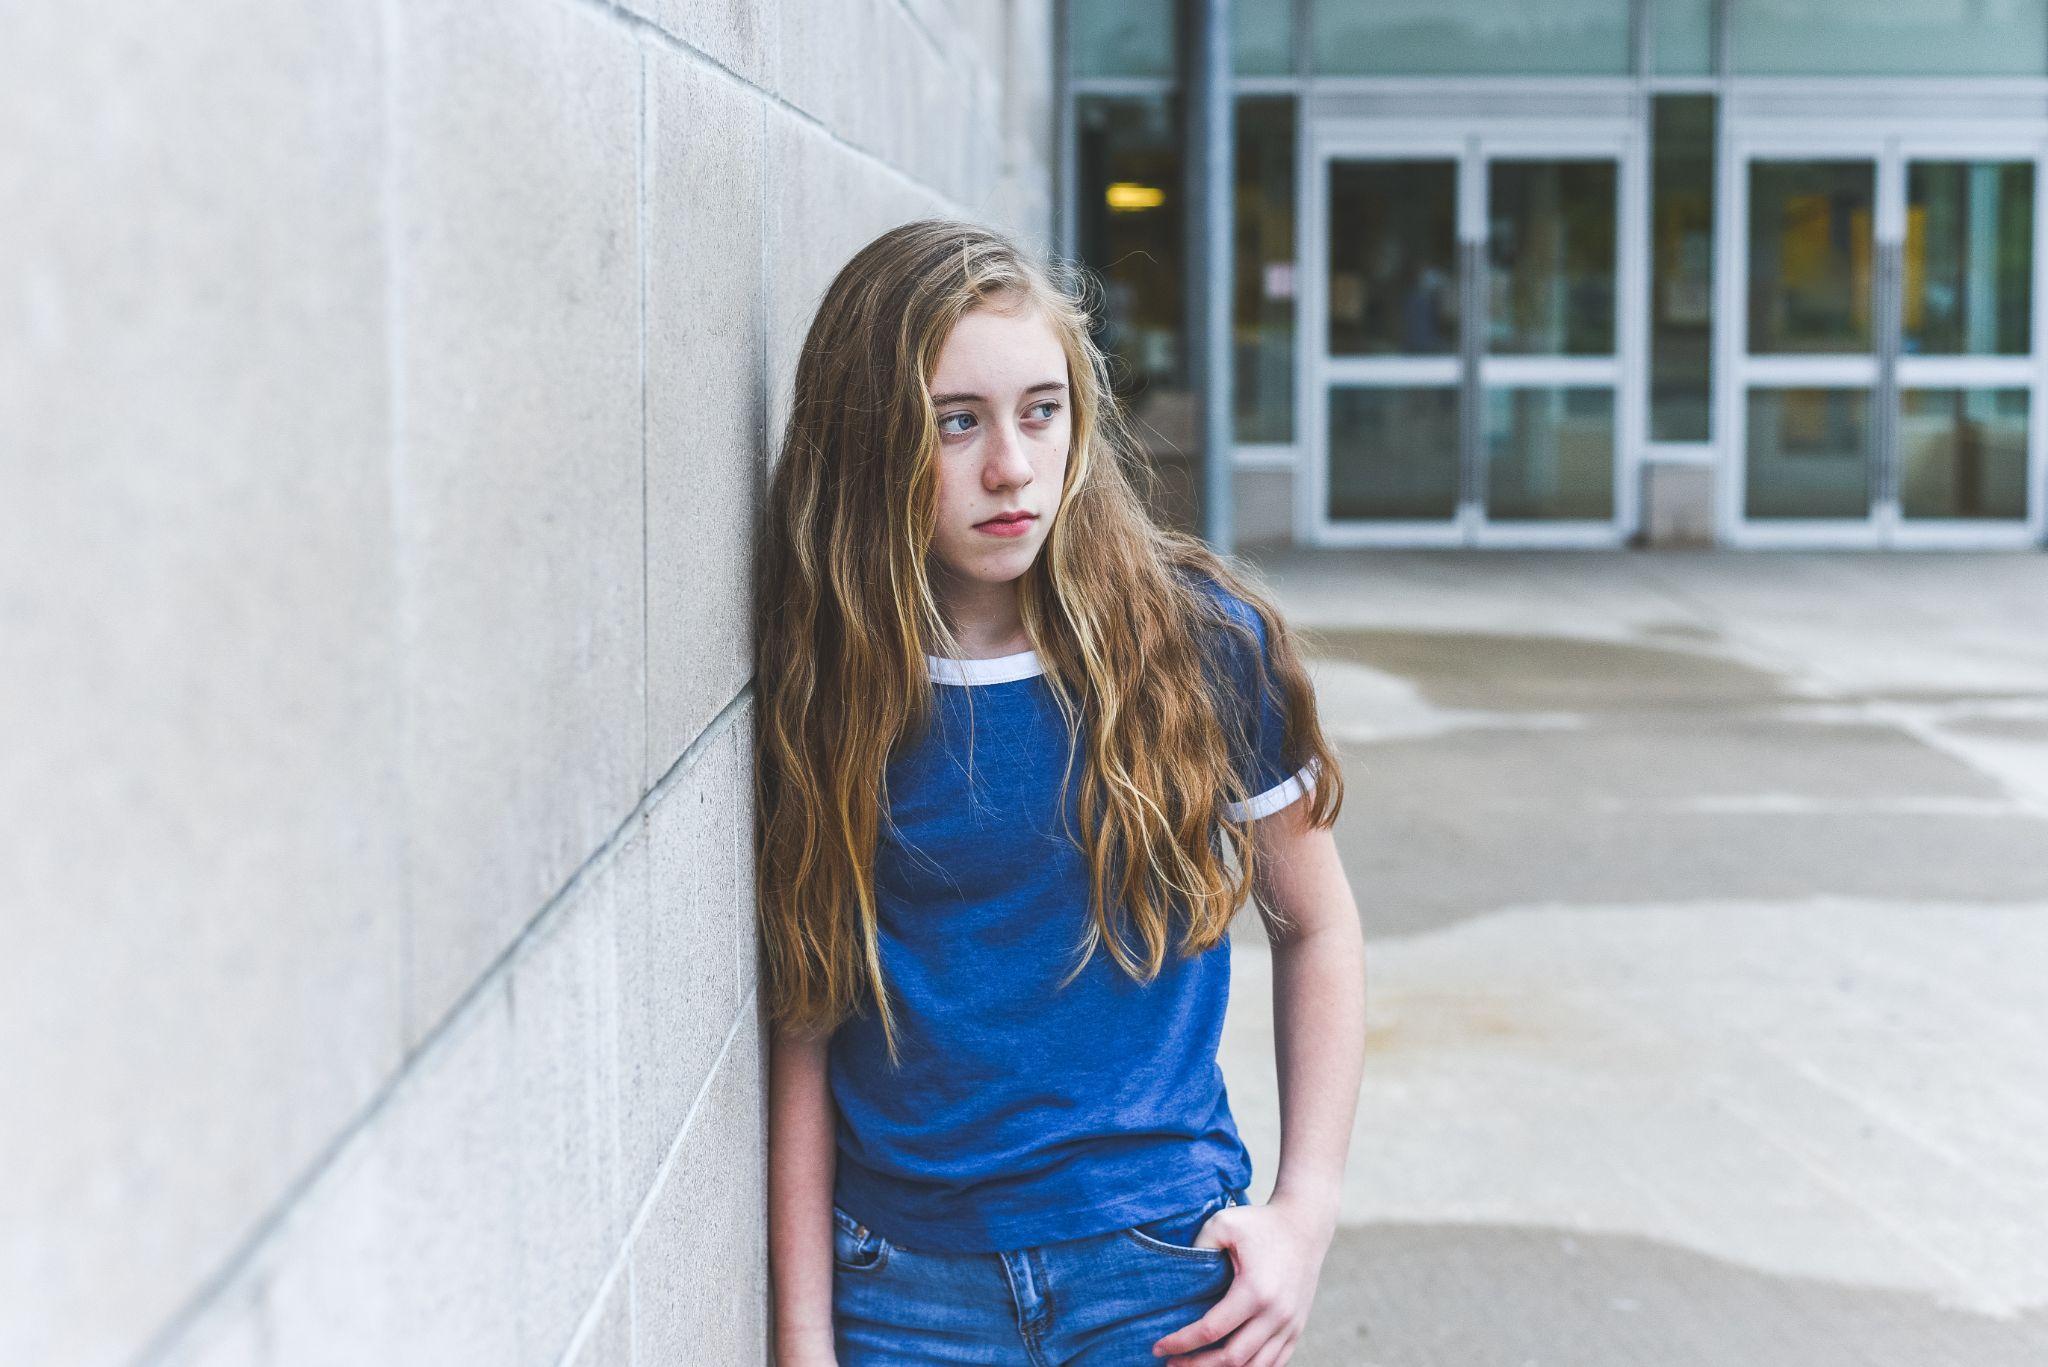 Sad teenage girl leaning against brick wall